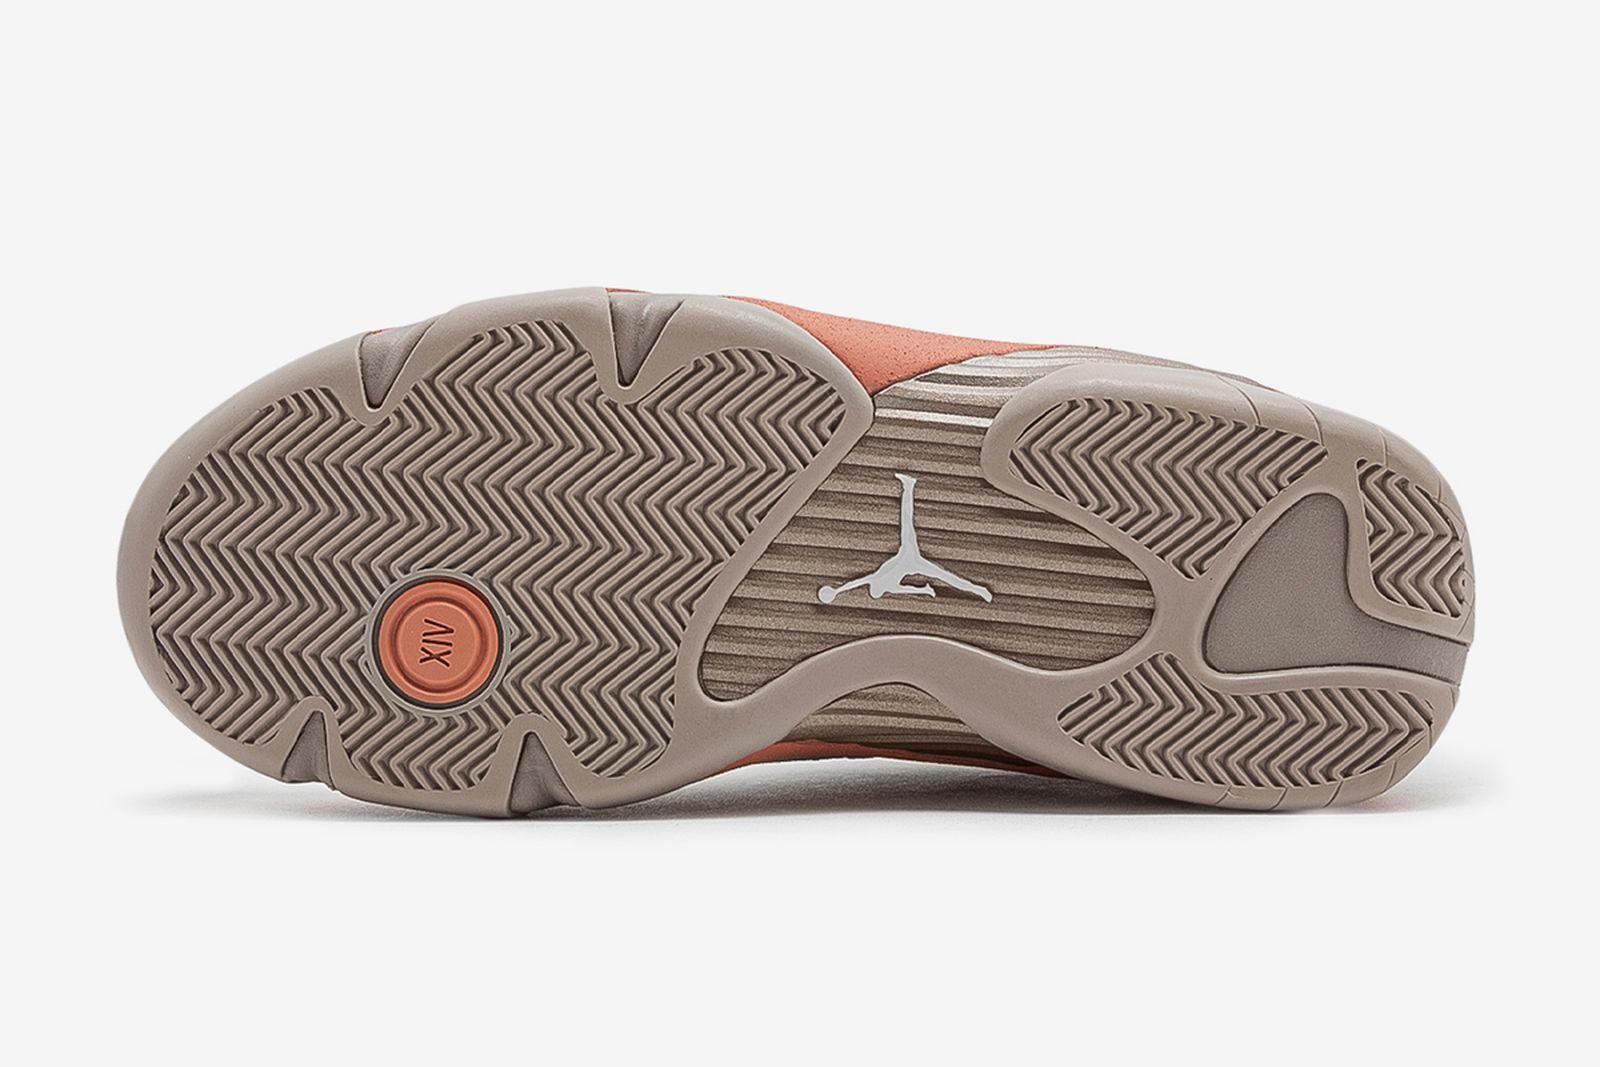 clot-air-jordan-14-low-terracotta-release-info-1-06